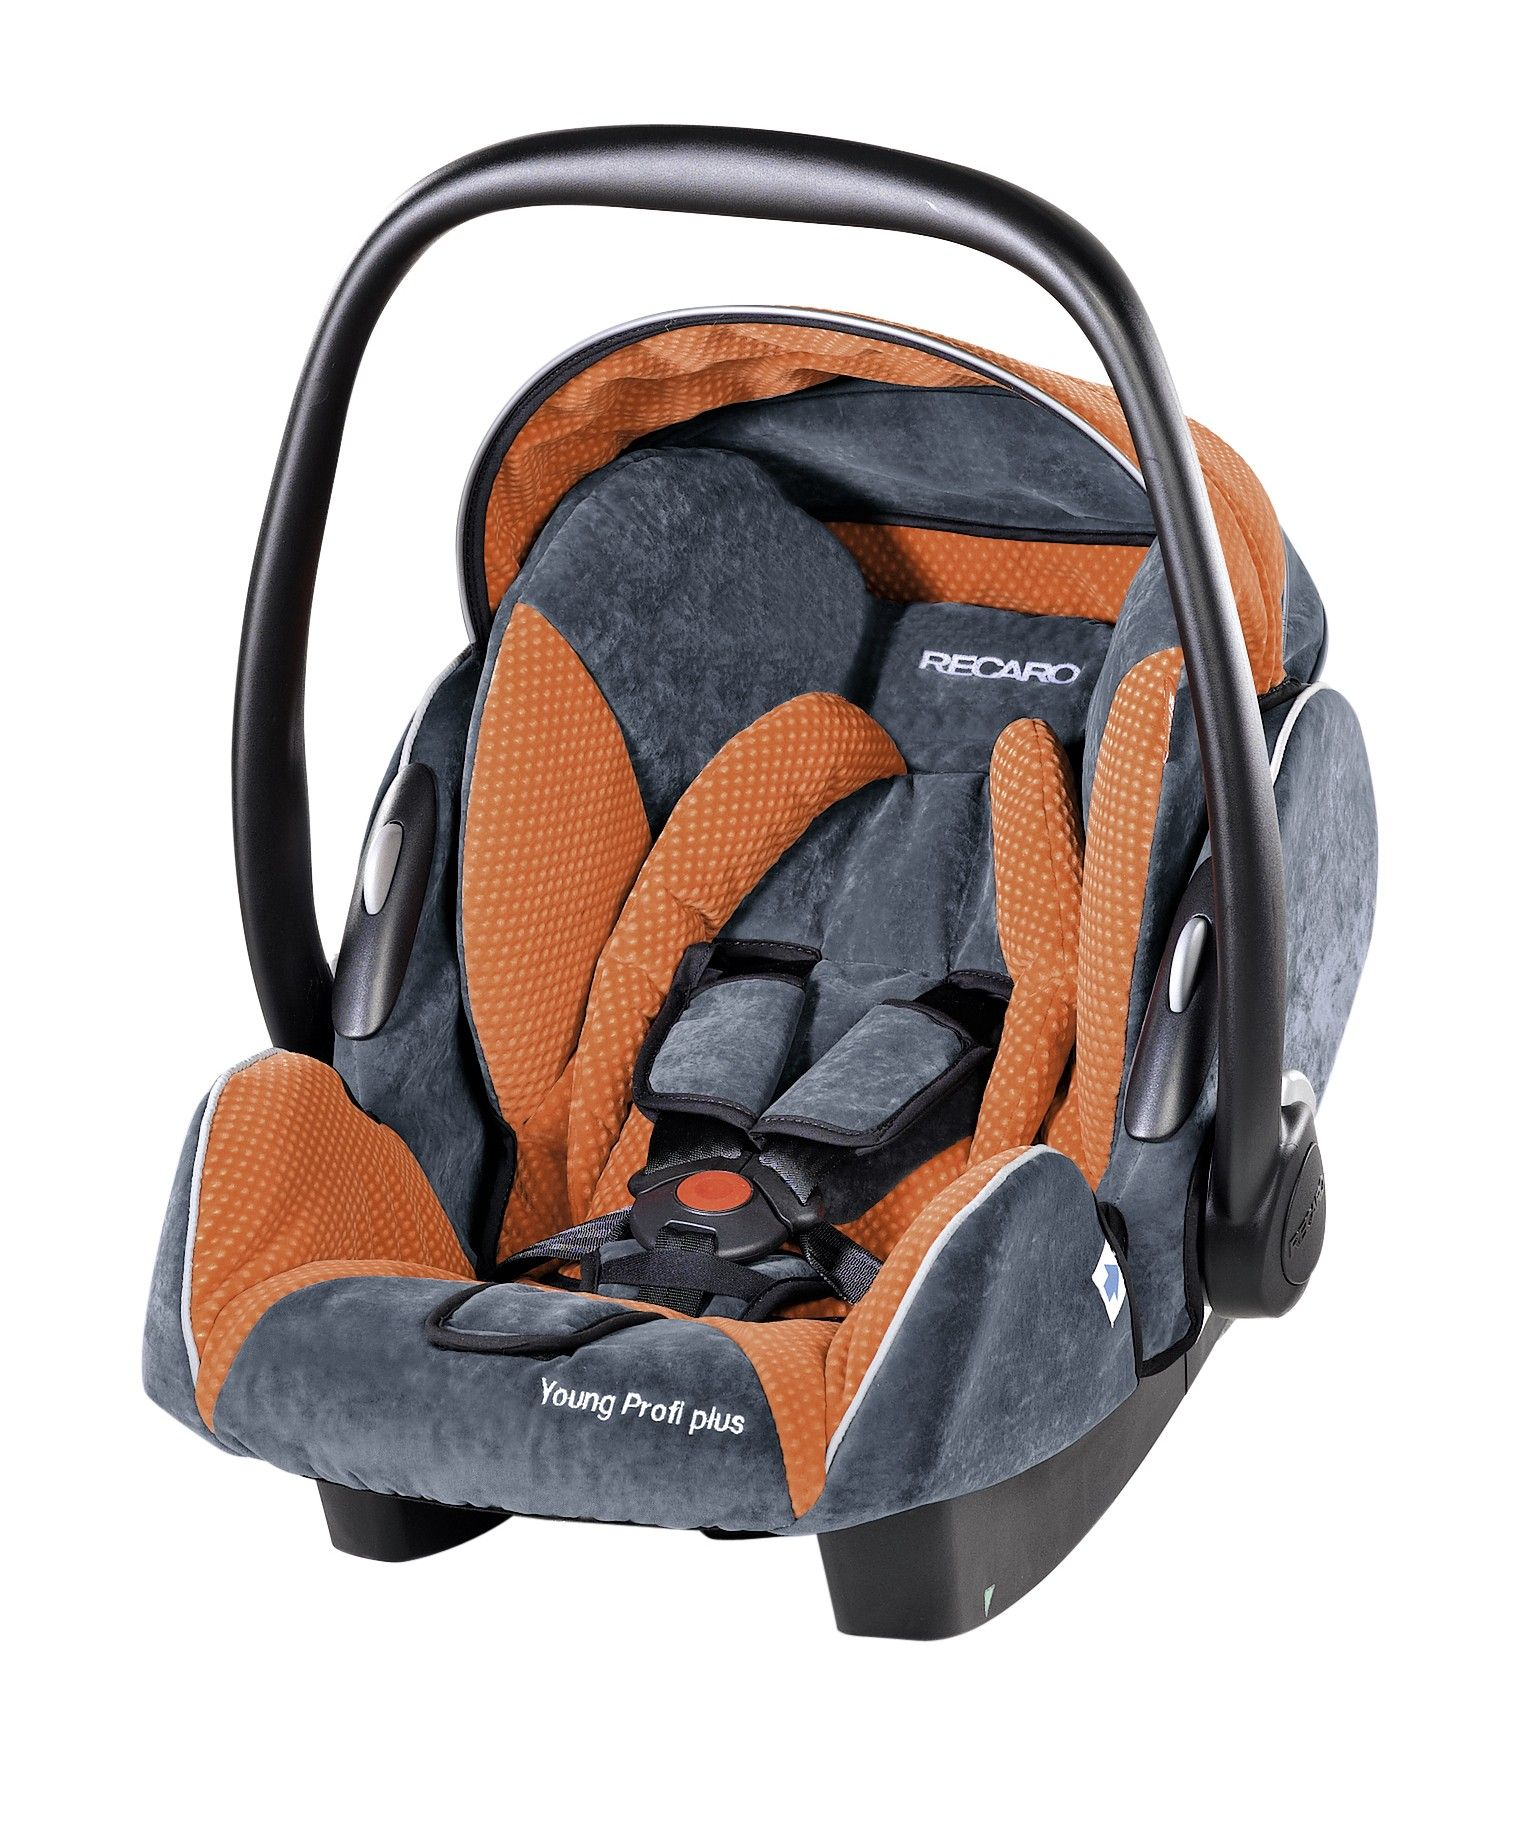 Recaro Young Profi Plus Microfibre Grey/Pepper Baby car